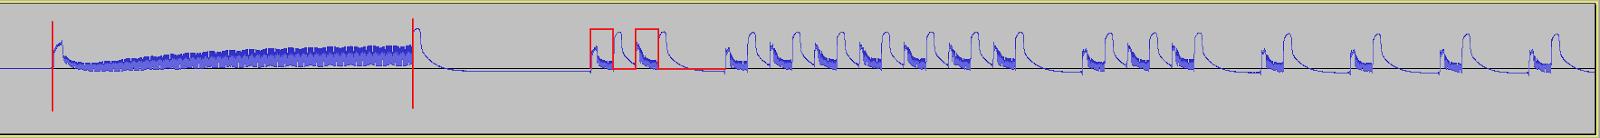 IR Waveform sampled at 192 kHz - Audacity screenshot